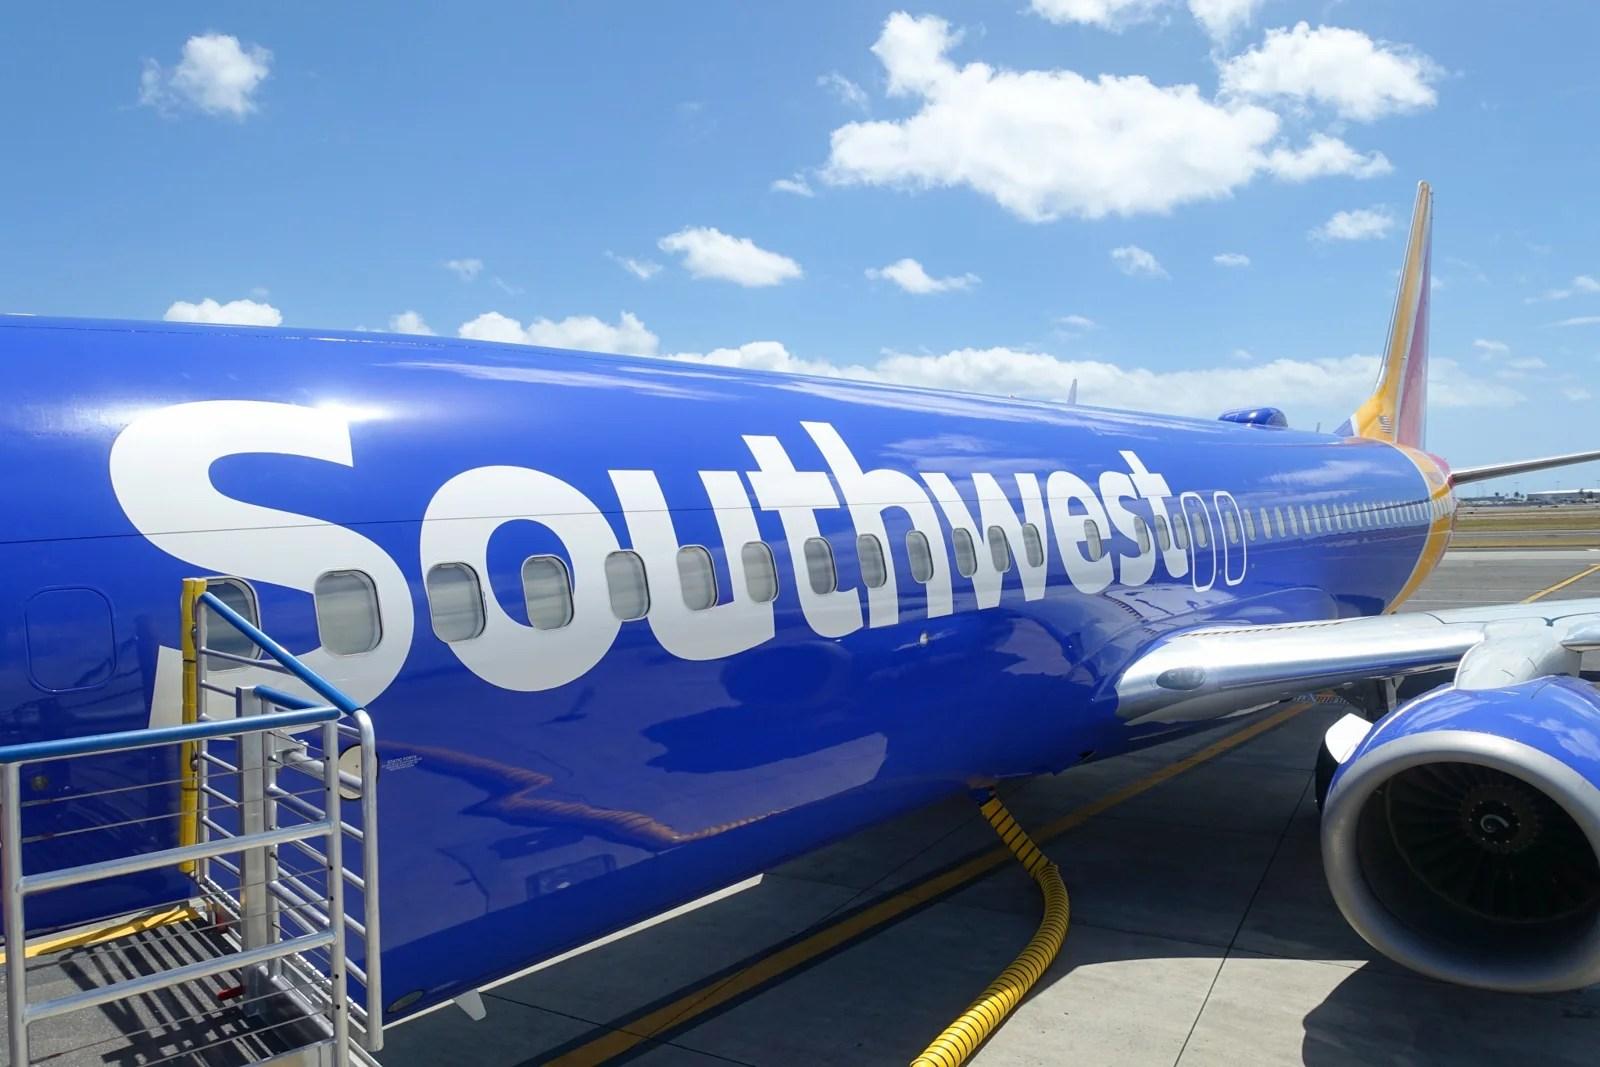 TPG Readers' Best Southwest Airlines Rapid Rewards Redemptions